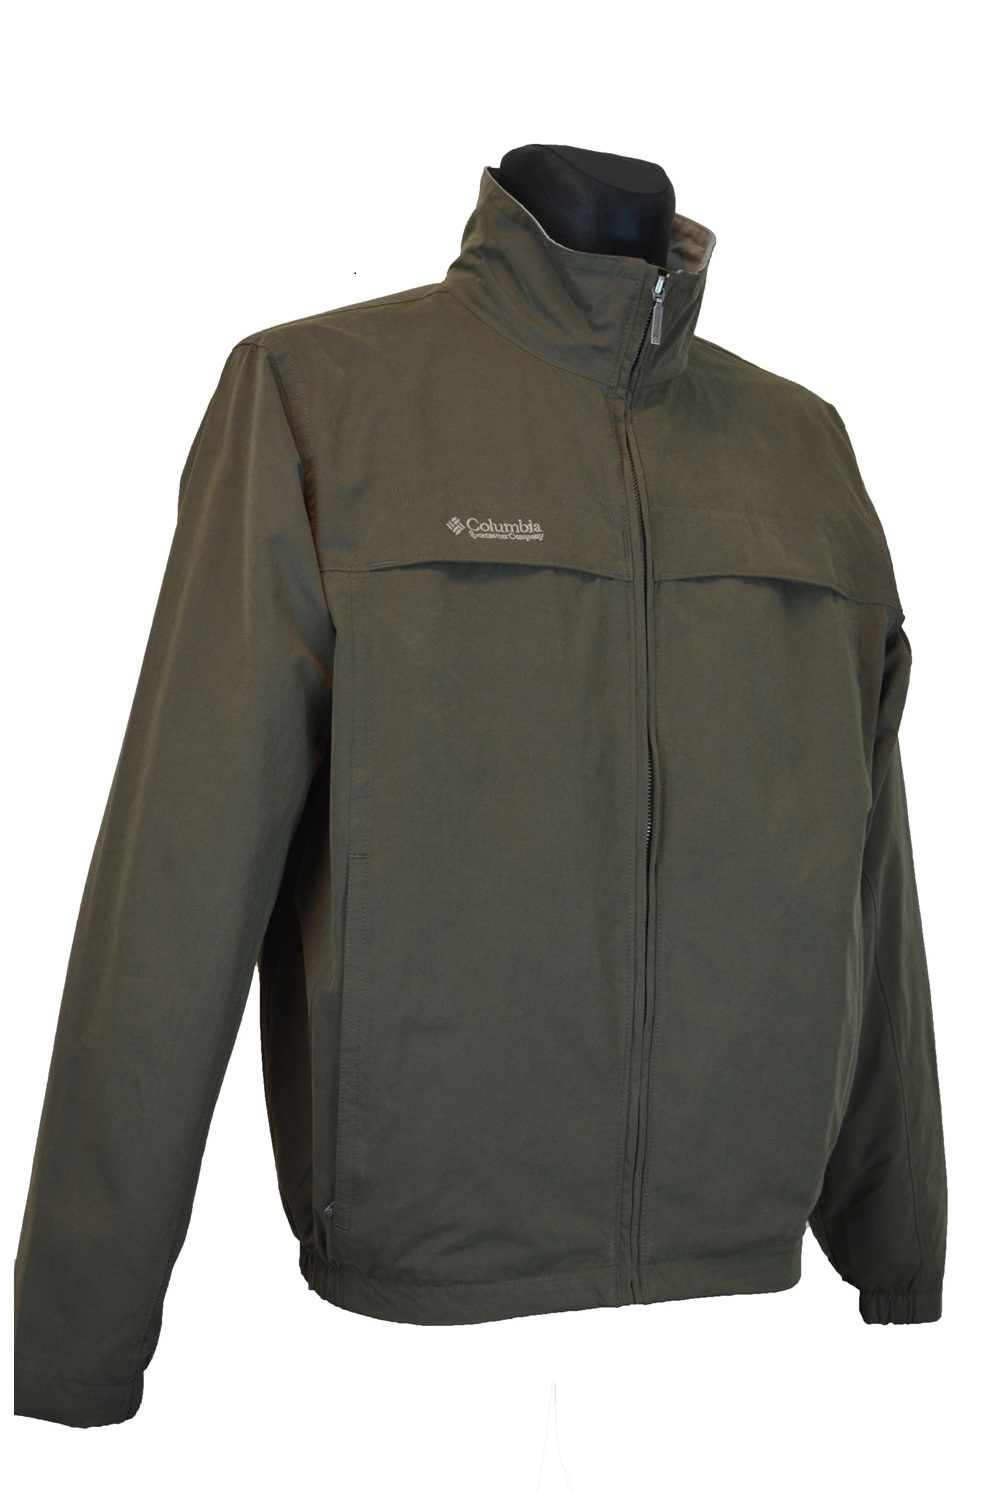 105a9a8f12dd Columbia Киев - мужские куртки, пуховики Columbia Omni Heat купить в ...